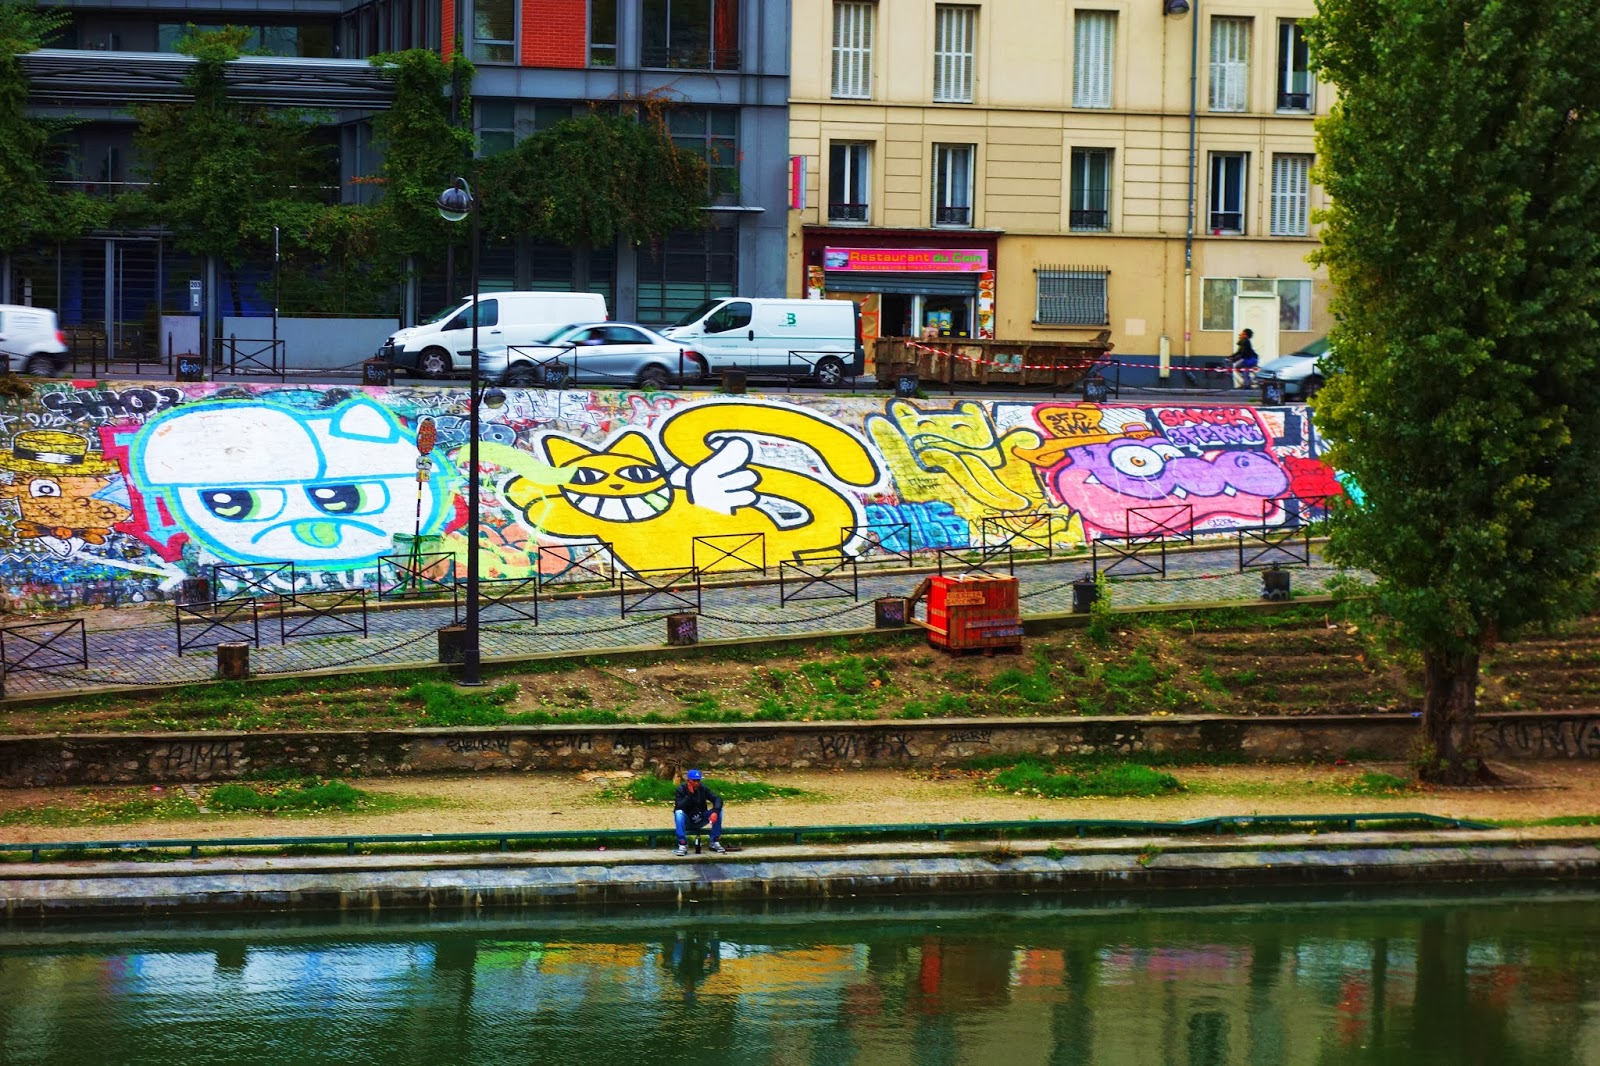 Sunday street art fresque commune quai de valmy jaur s paris 10 paris la douce - Restaurant quai de valmy ...